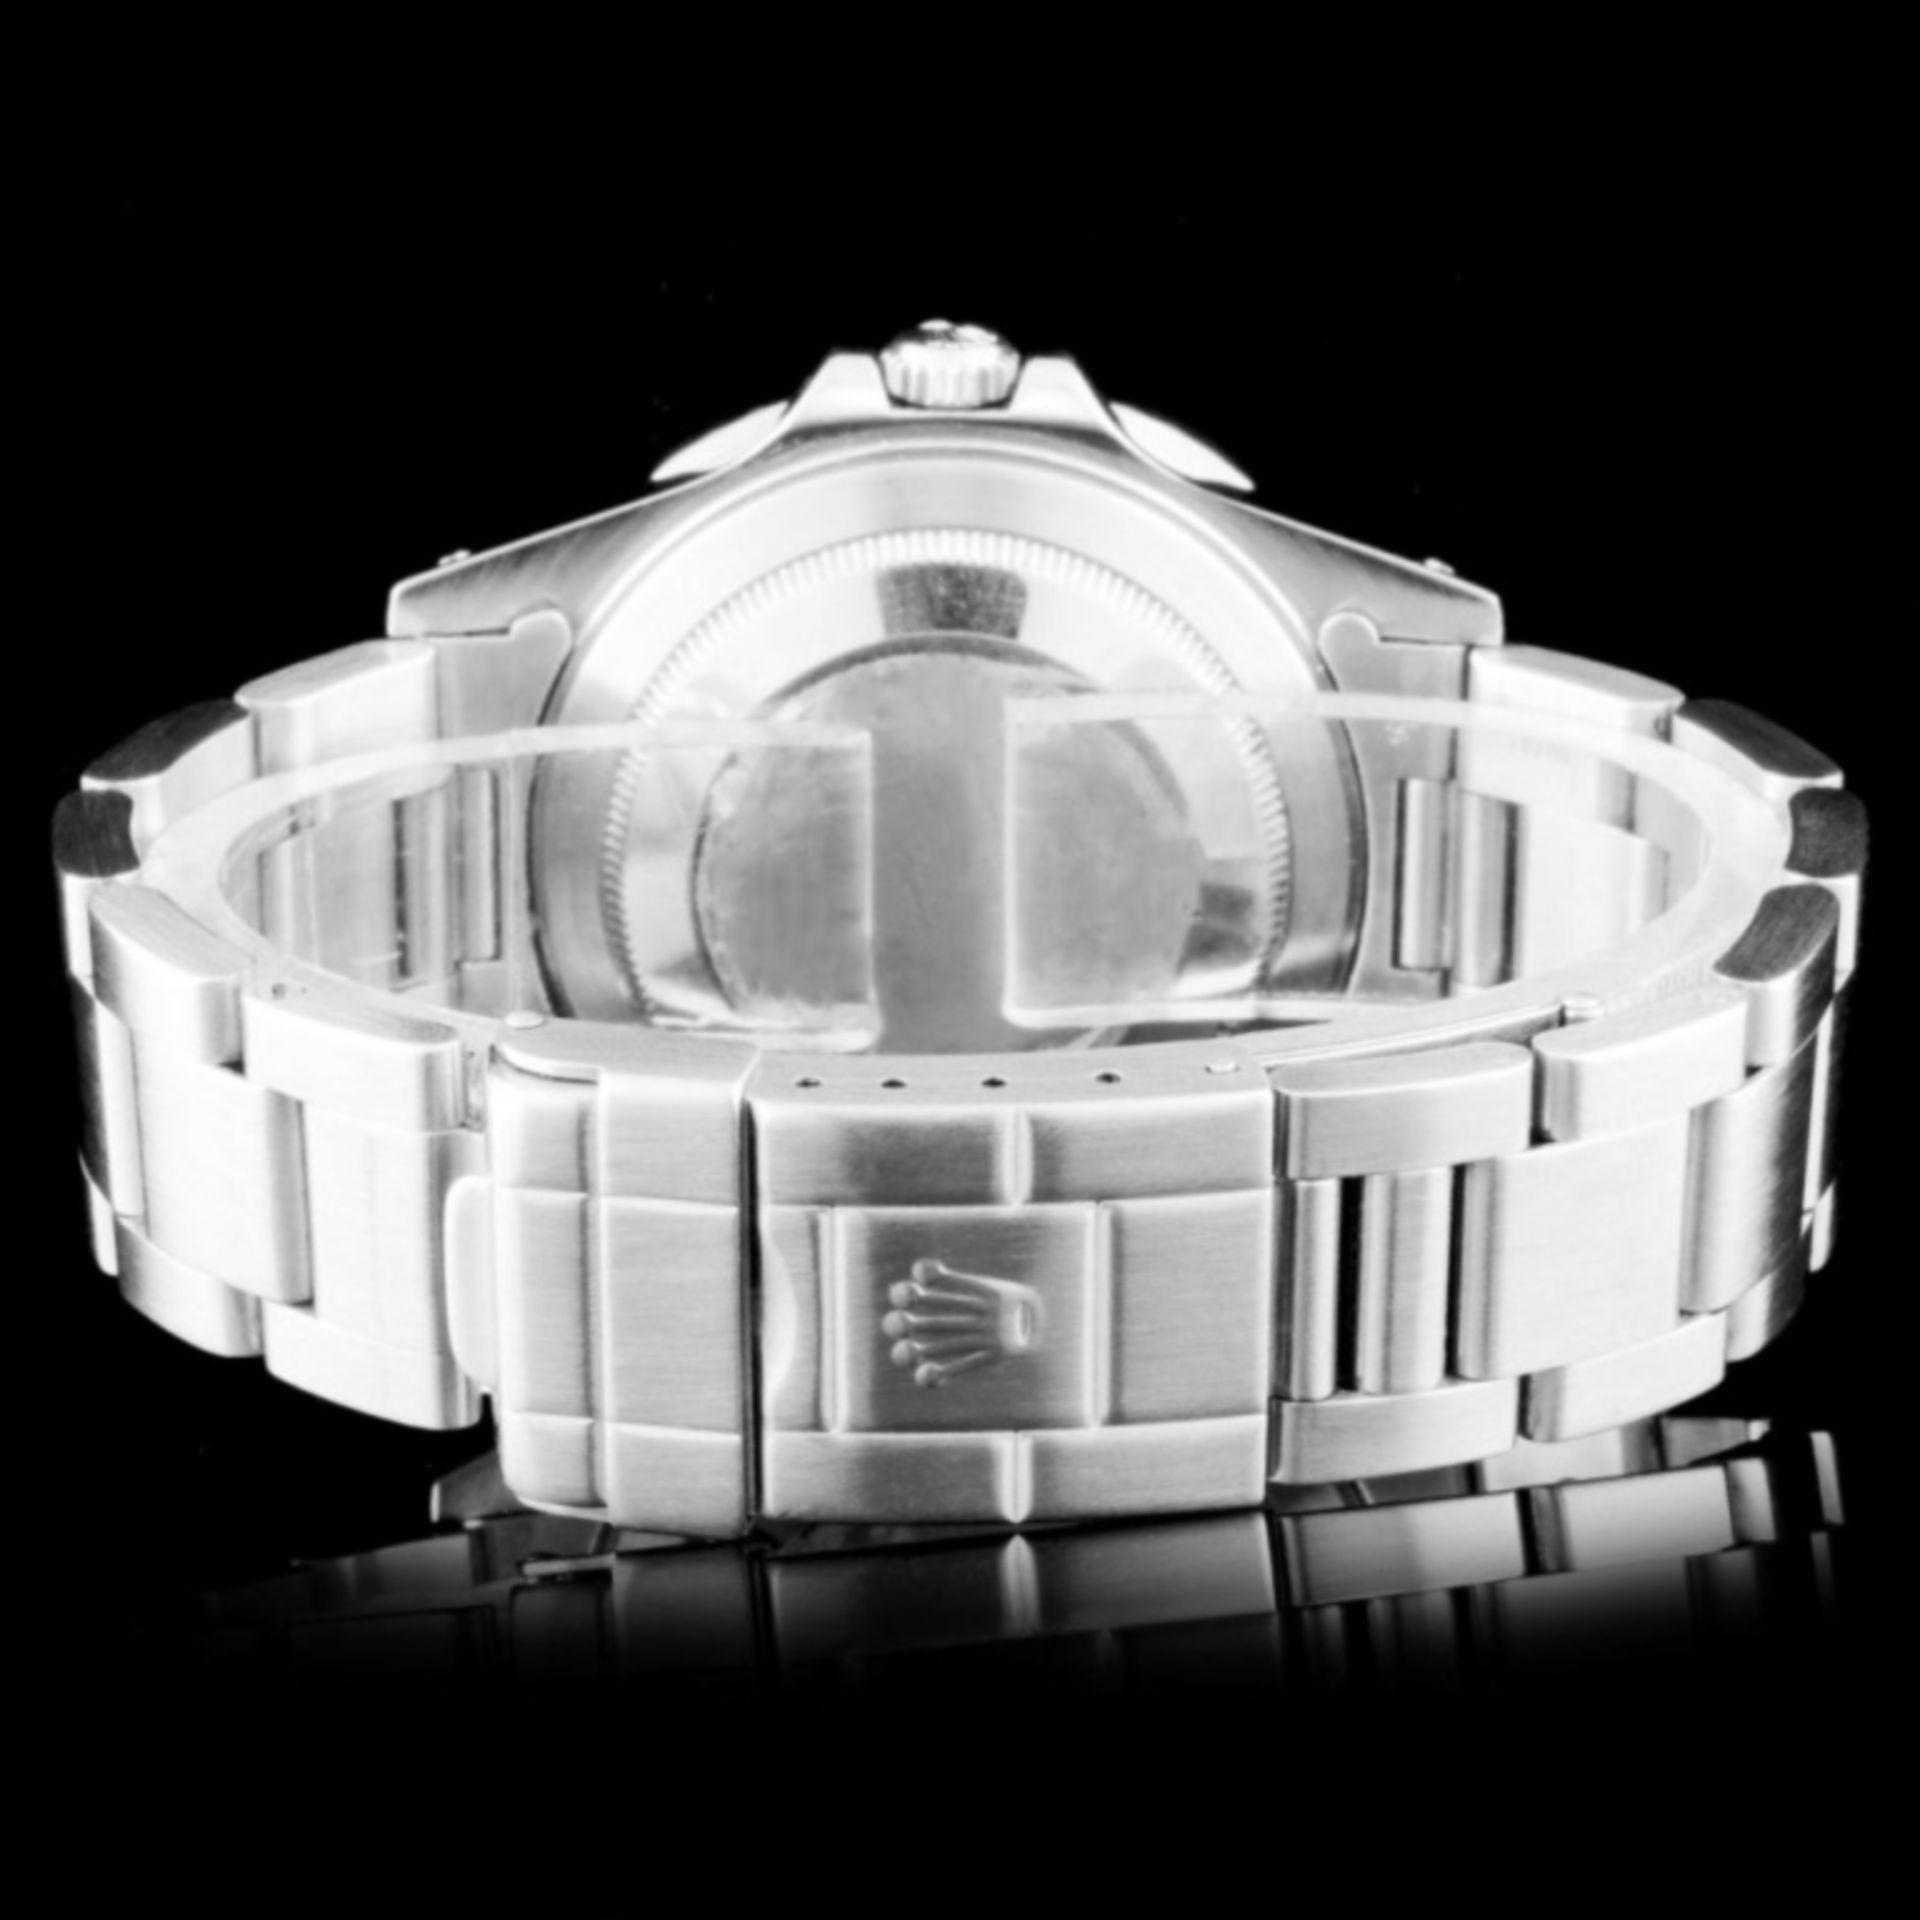 Rolex SS Submariner 40MM Wristwatch - Image 3 of 5